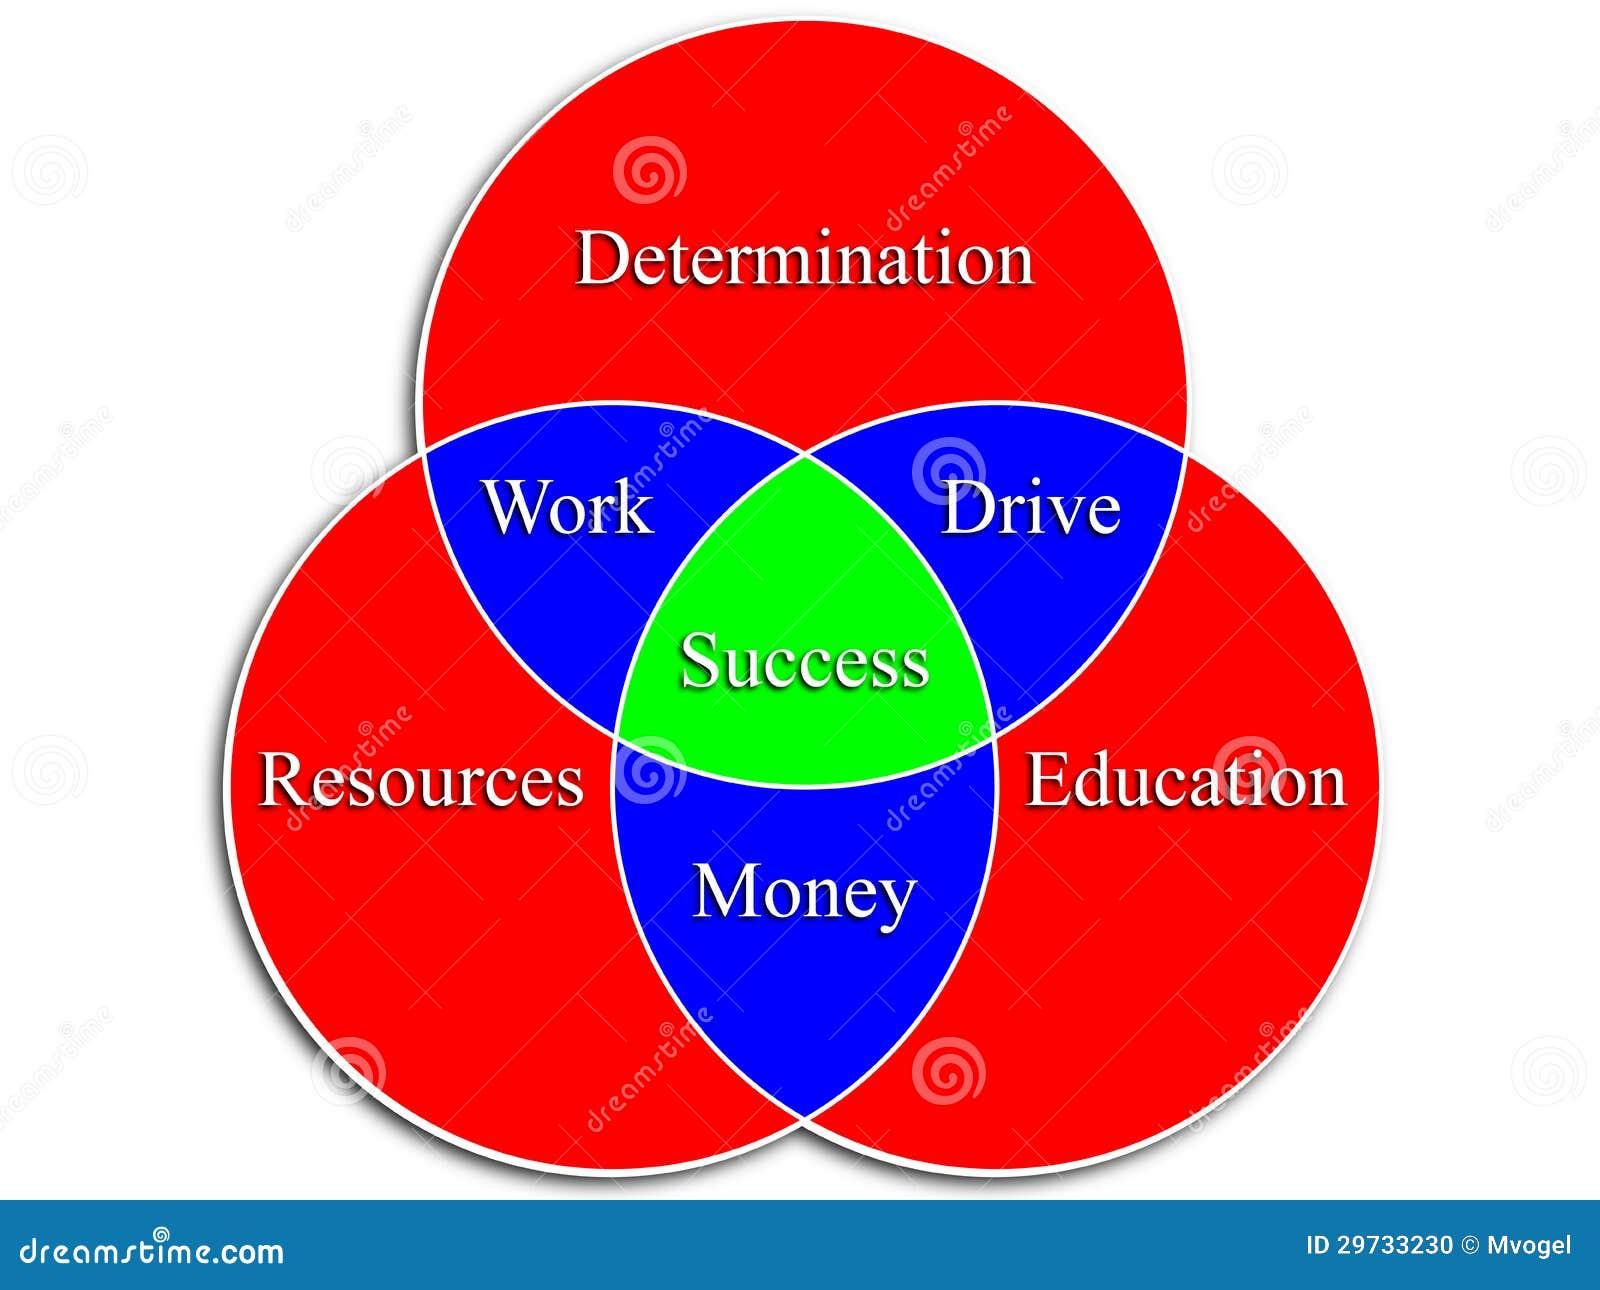 Success venn diagram stock illustration illustration of blue success venn diagram pooptronica